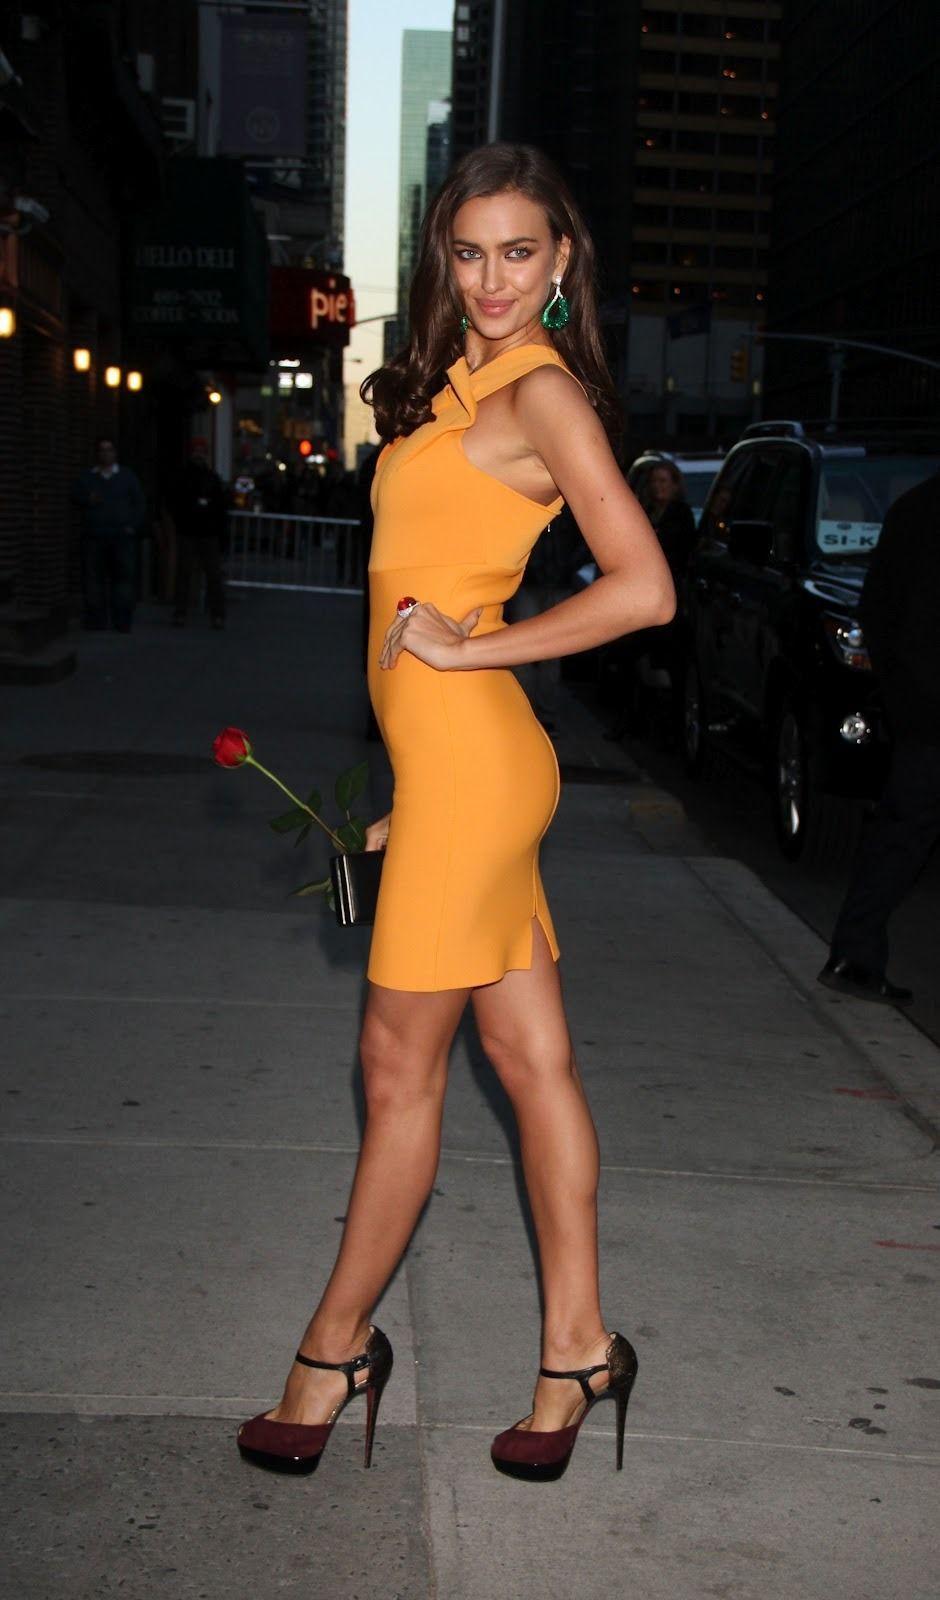 Irina Shayk Sexy Legs In A Curve Hugging Mustard Colored